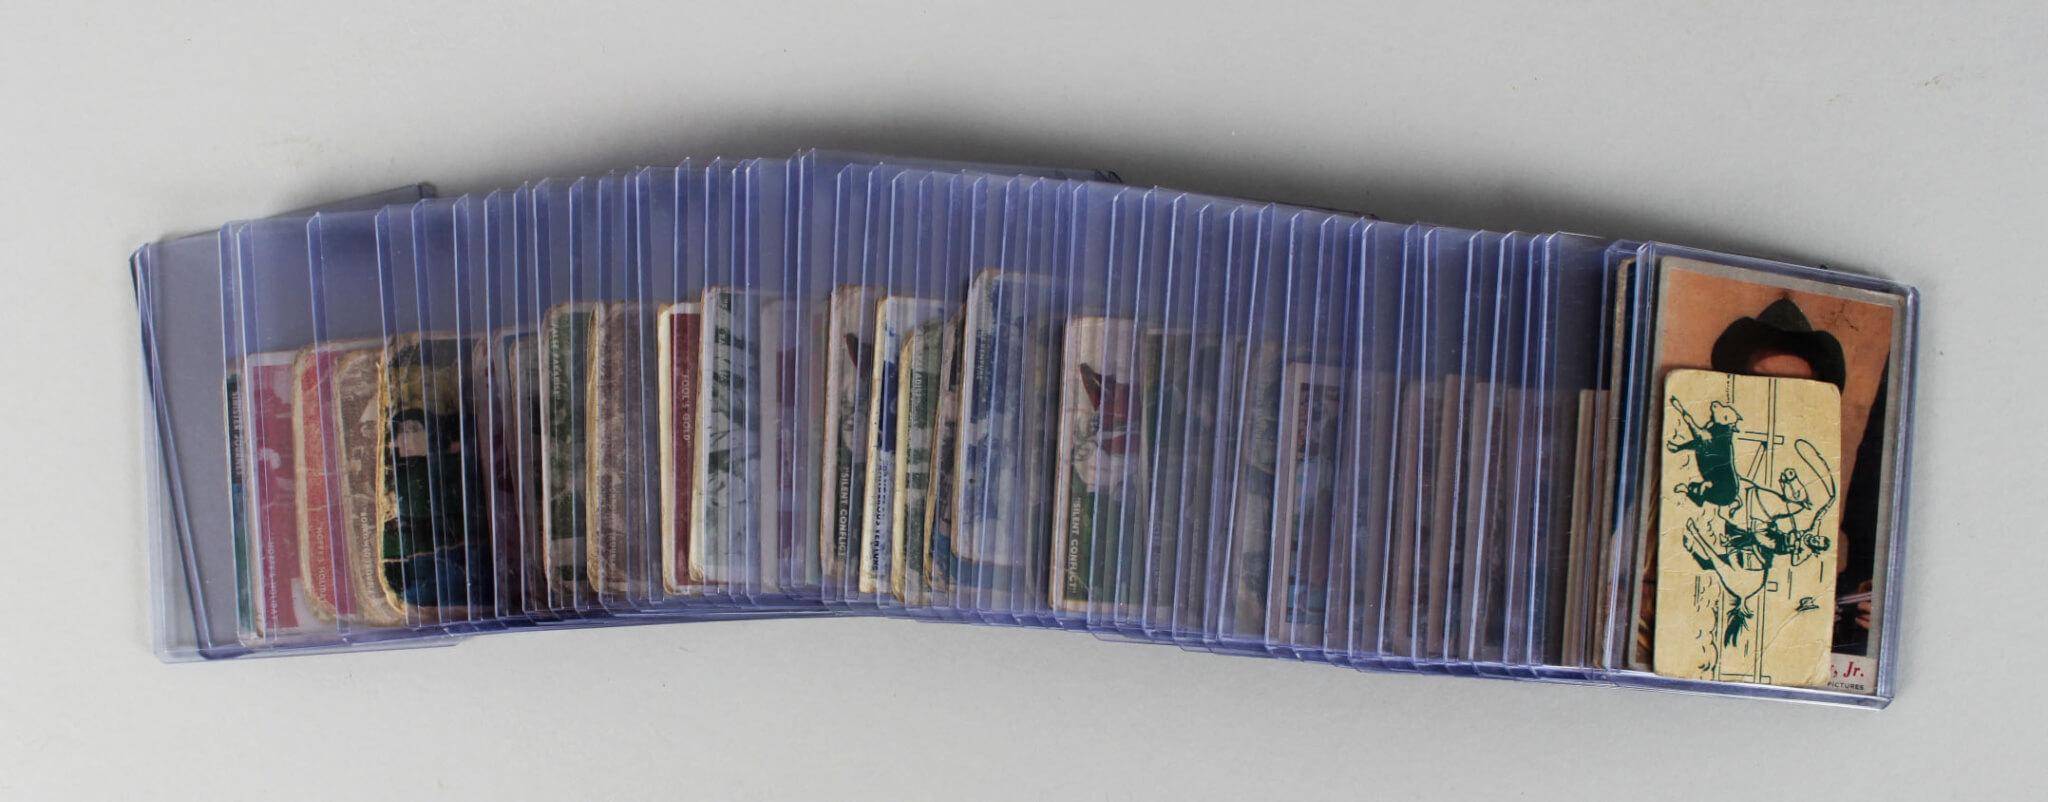 Vintage Non-Sport Western TV Show 50+ Card Lot Incl. Hopalong Cassidy